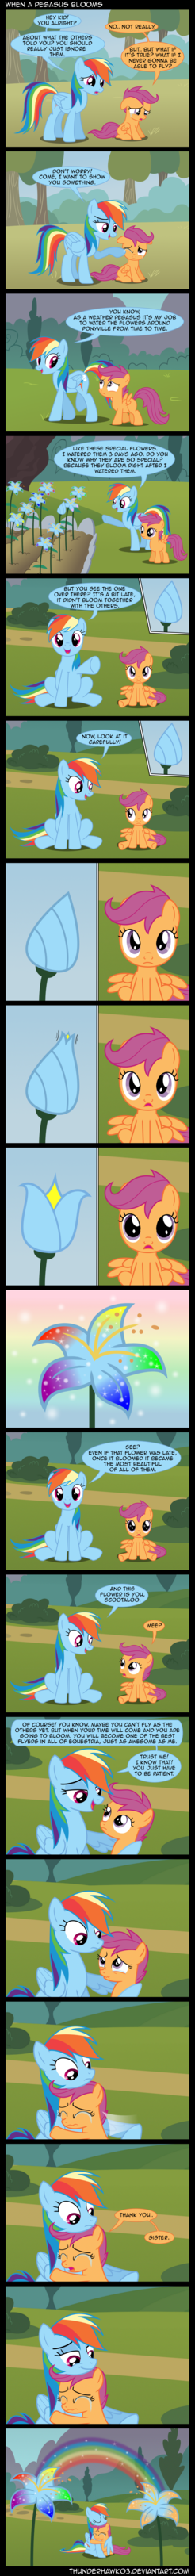 When A Pegasus Blooms